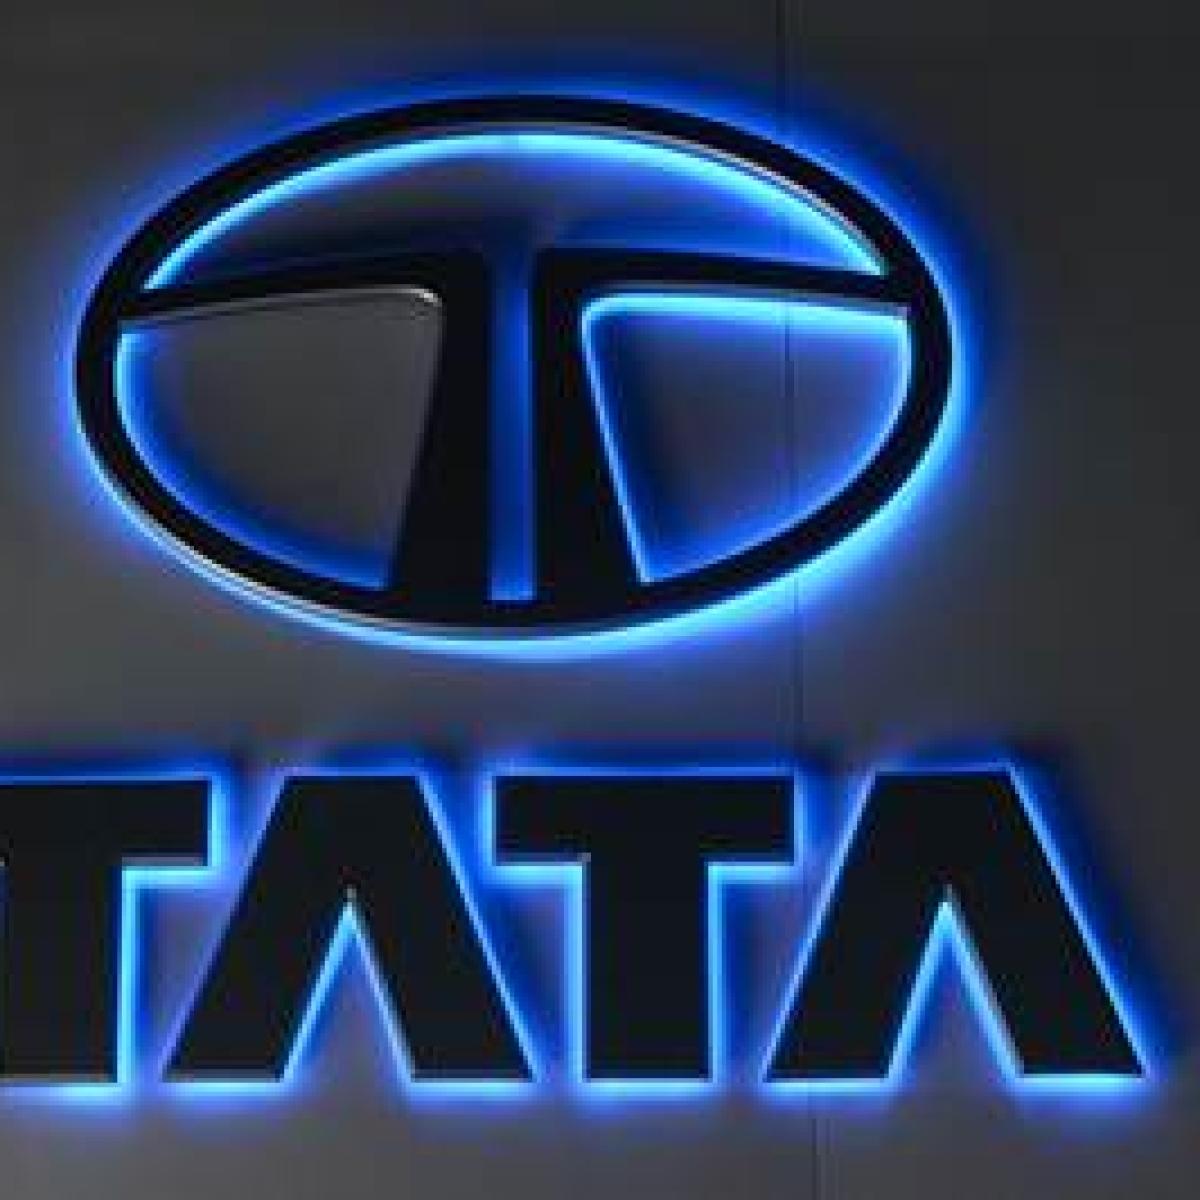 Tata Motors domestic sales fall 12 pc to 44,254 units in December